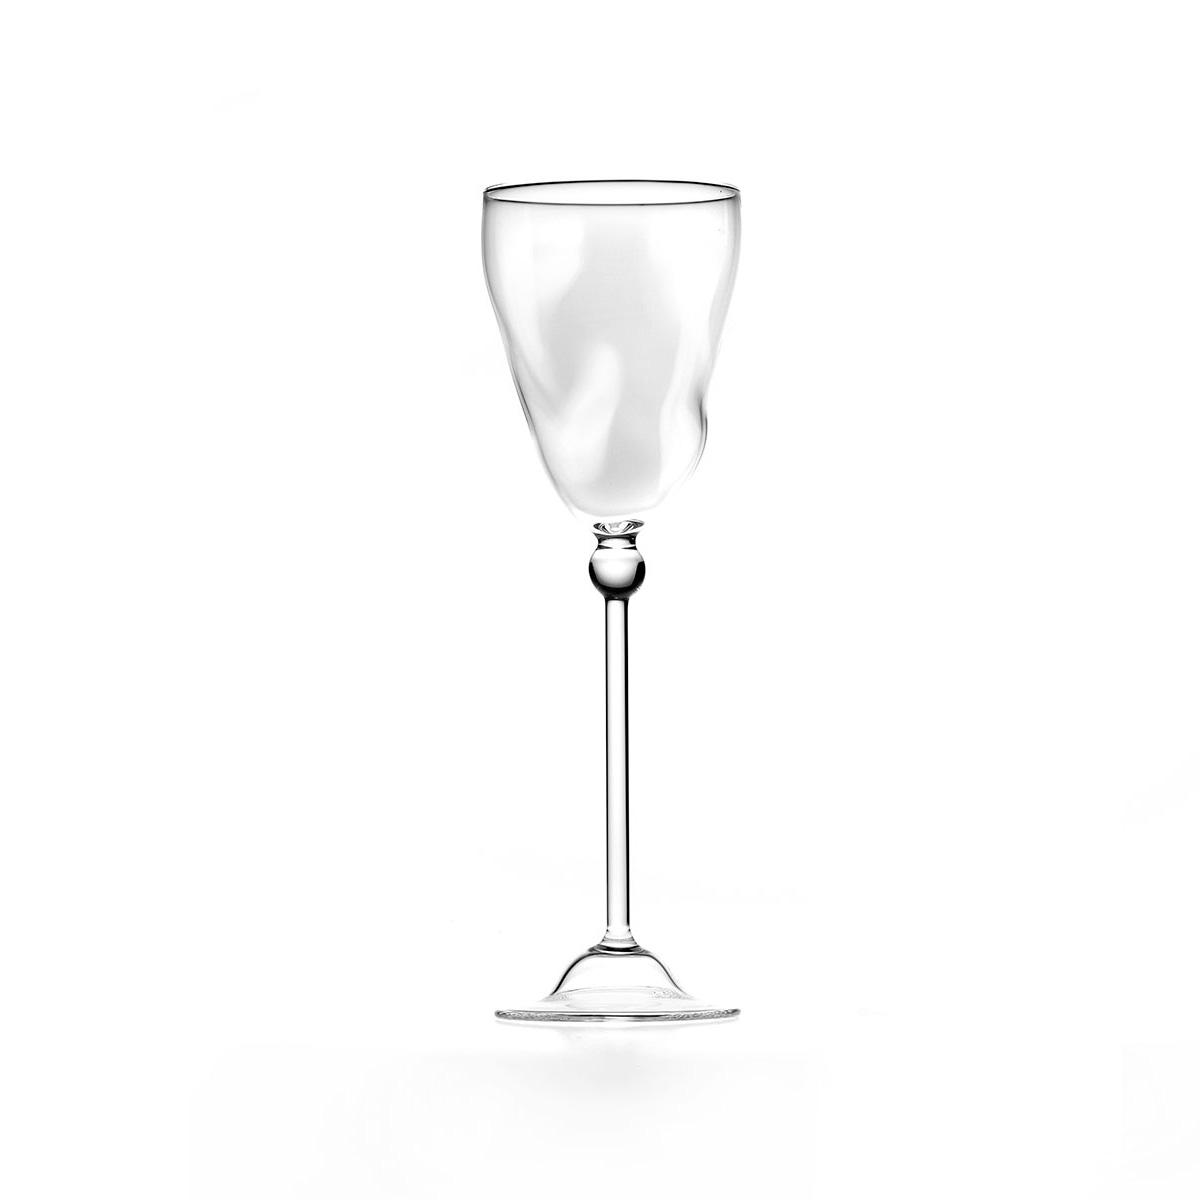 Twisted wine glass C17